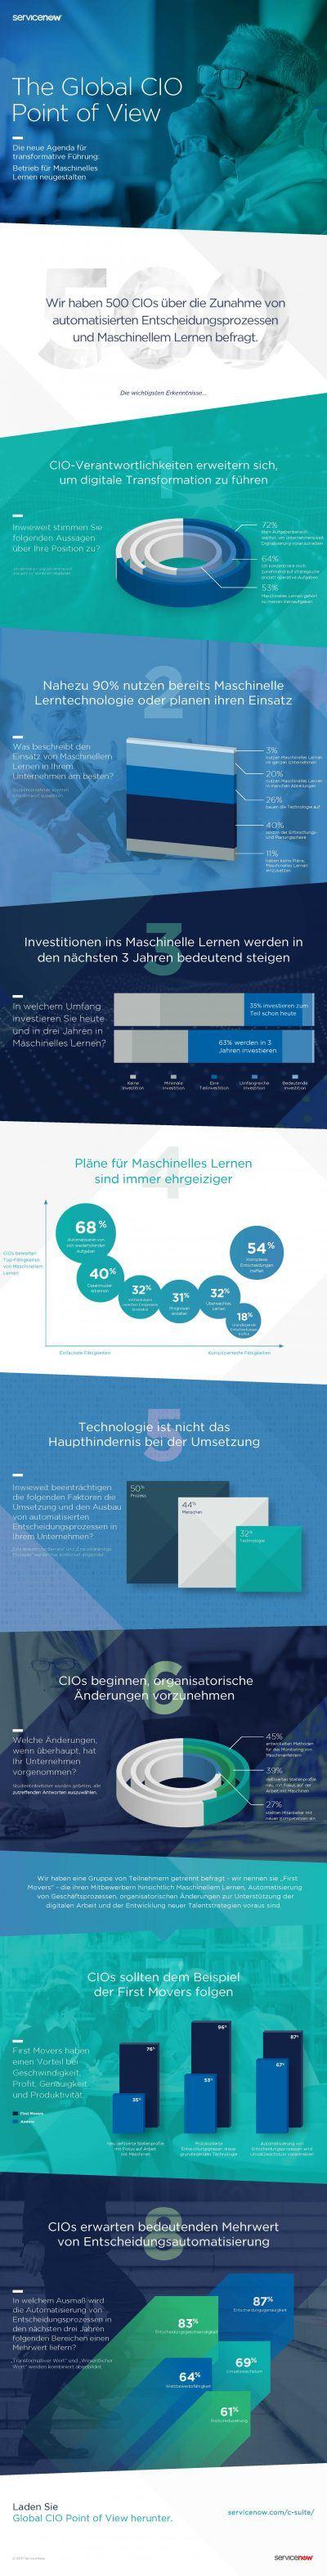 Servicenow-CIO POV Global Infographic_DE